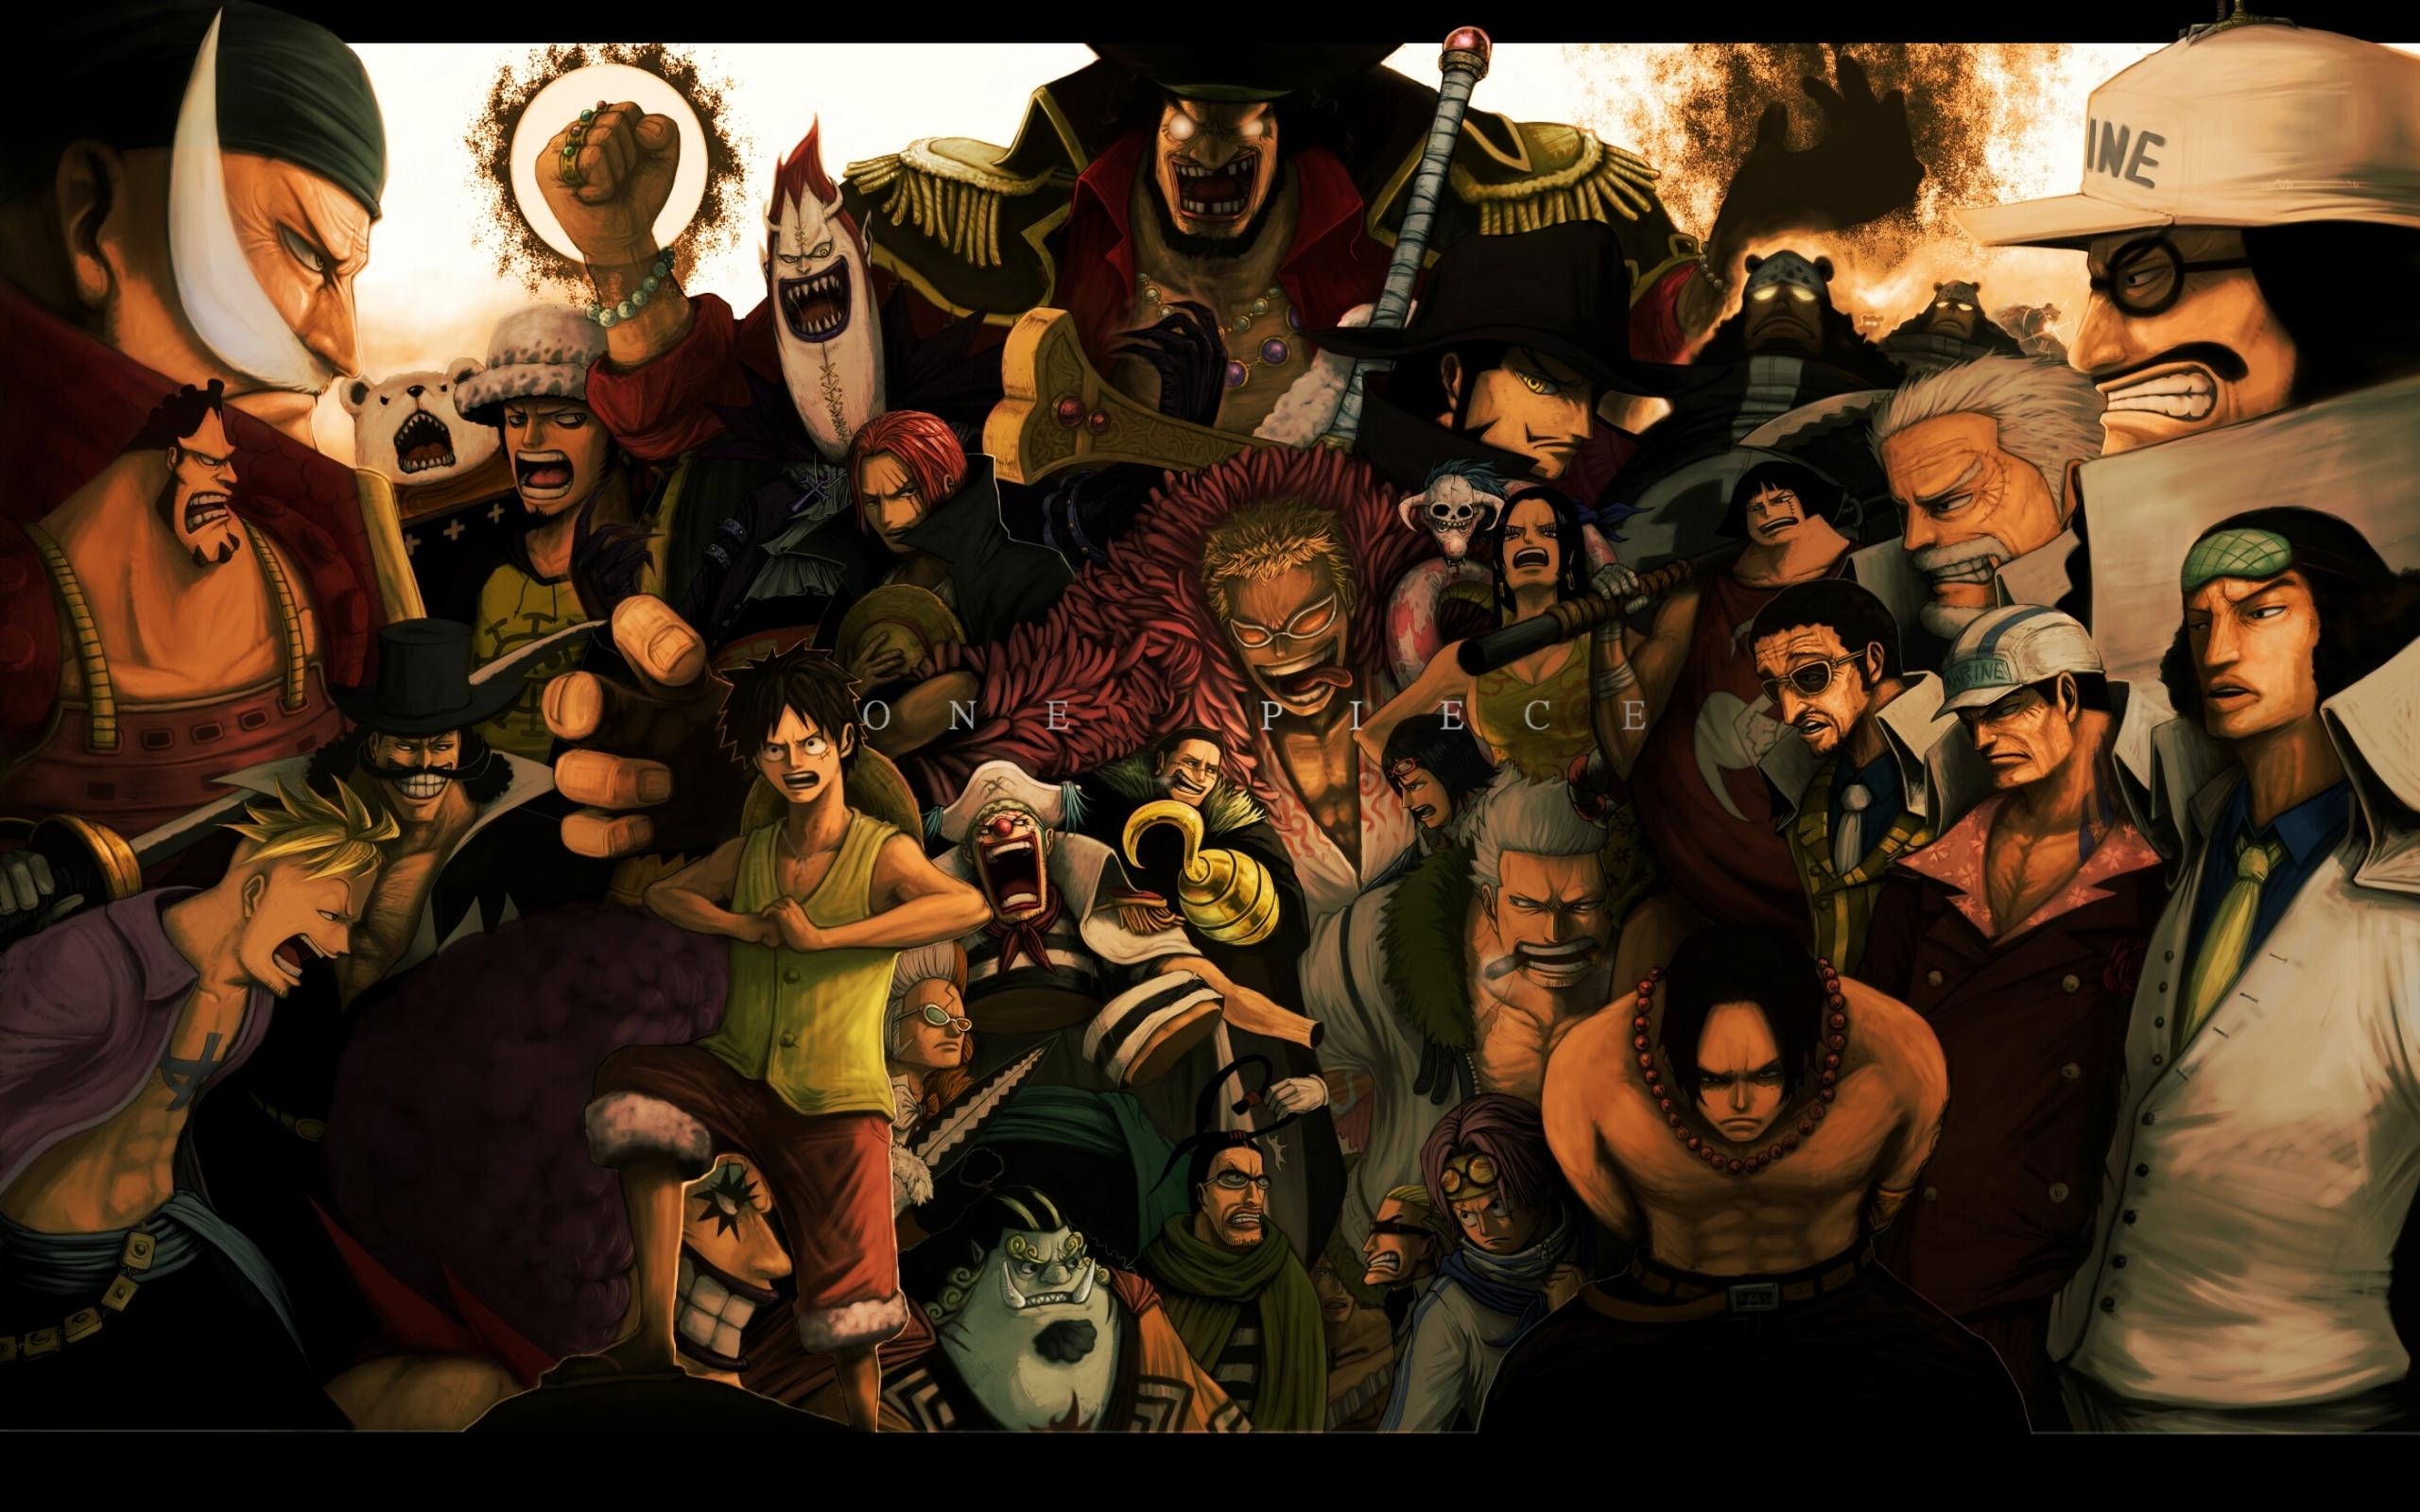 One-Piece-Marineford-arc-wallpaper